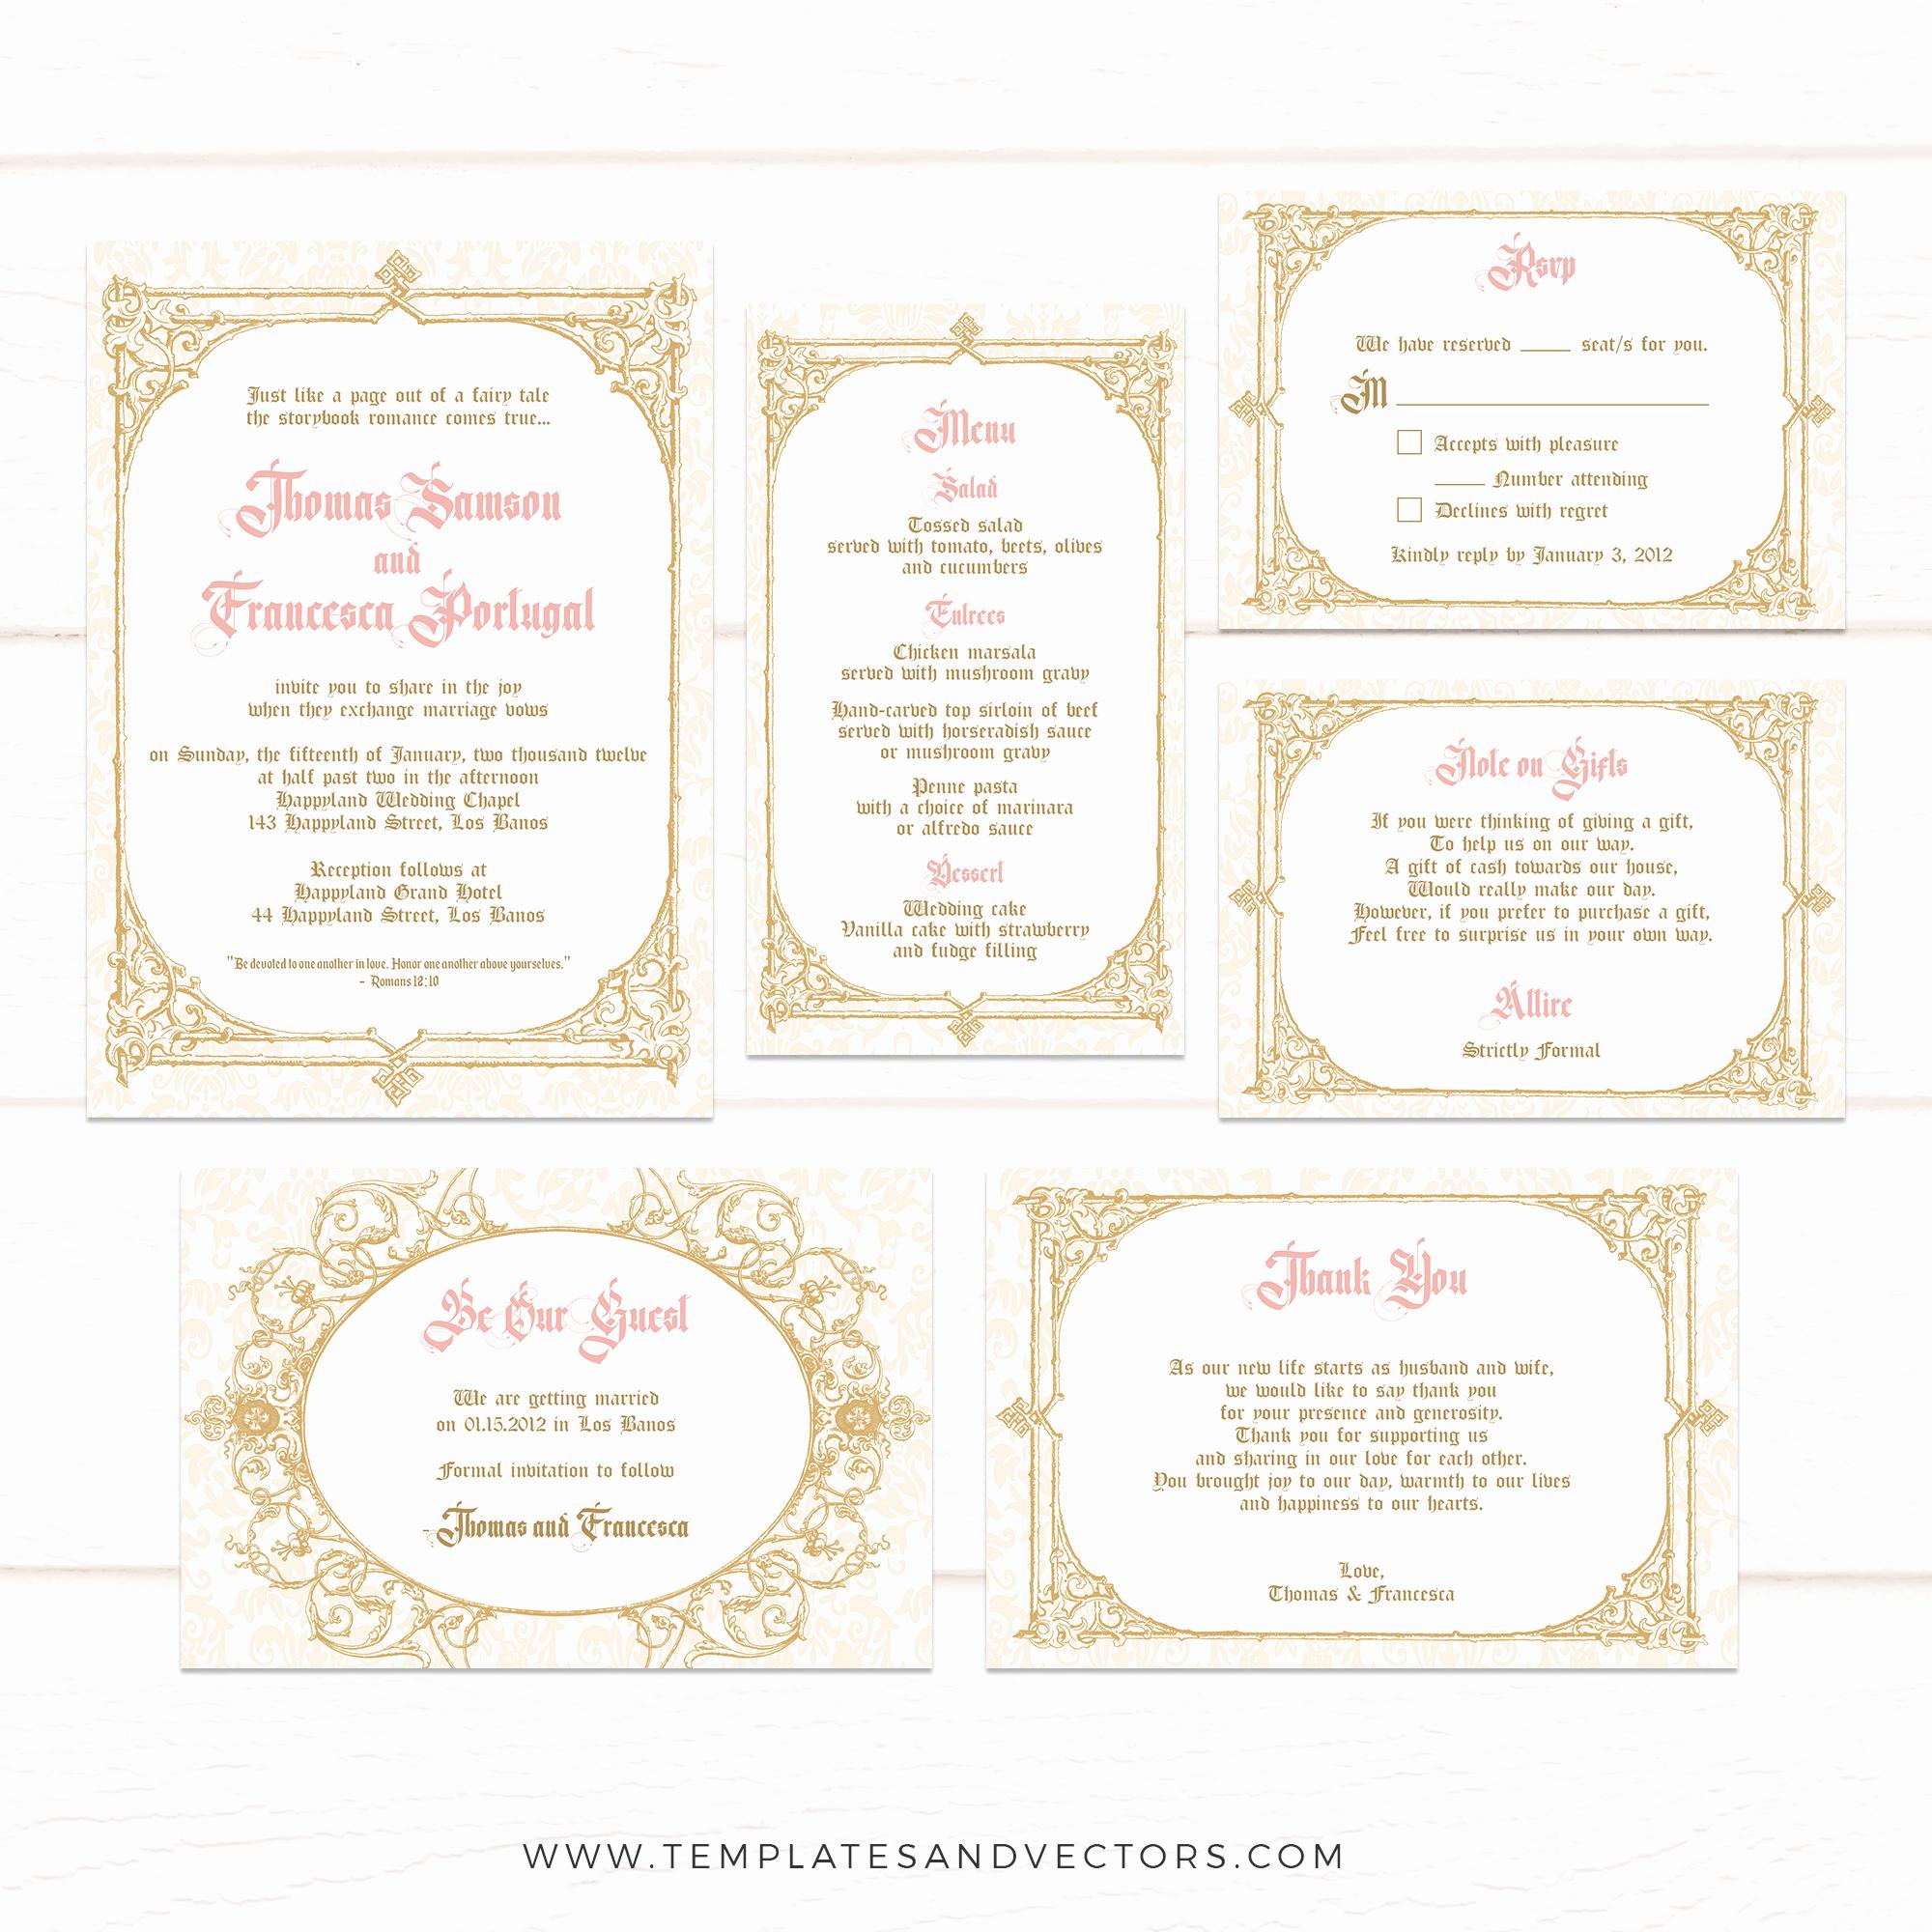 Royal Wedding Invitation Template Luxury Tvw184 Be Our Guest Royal Wedding Invitation Template